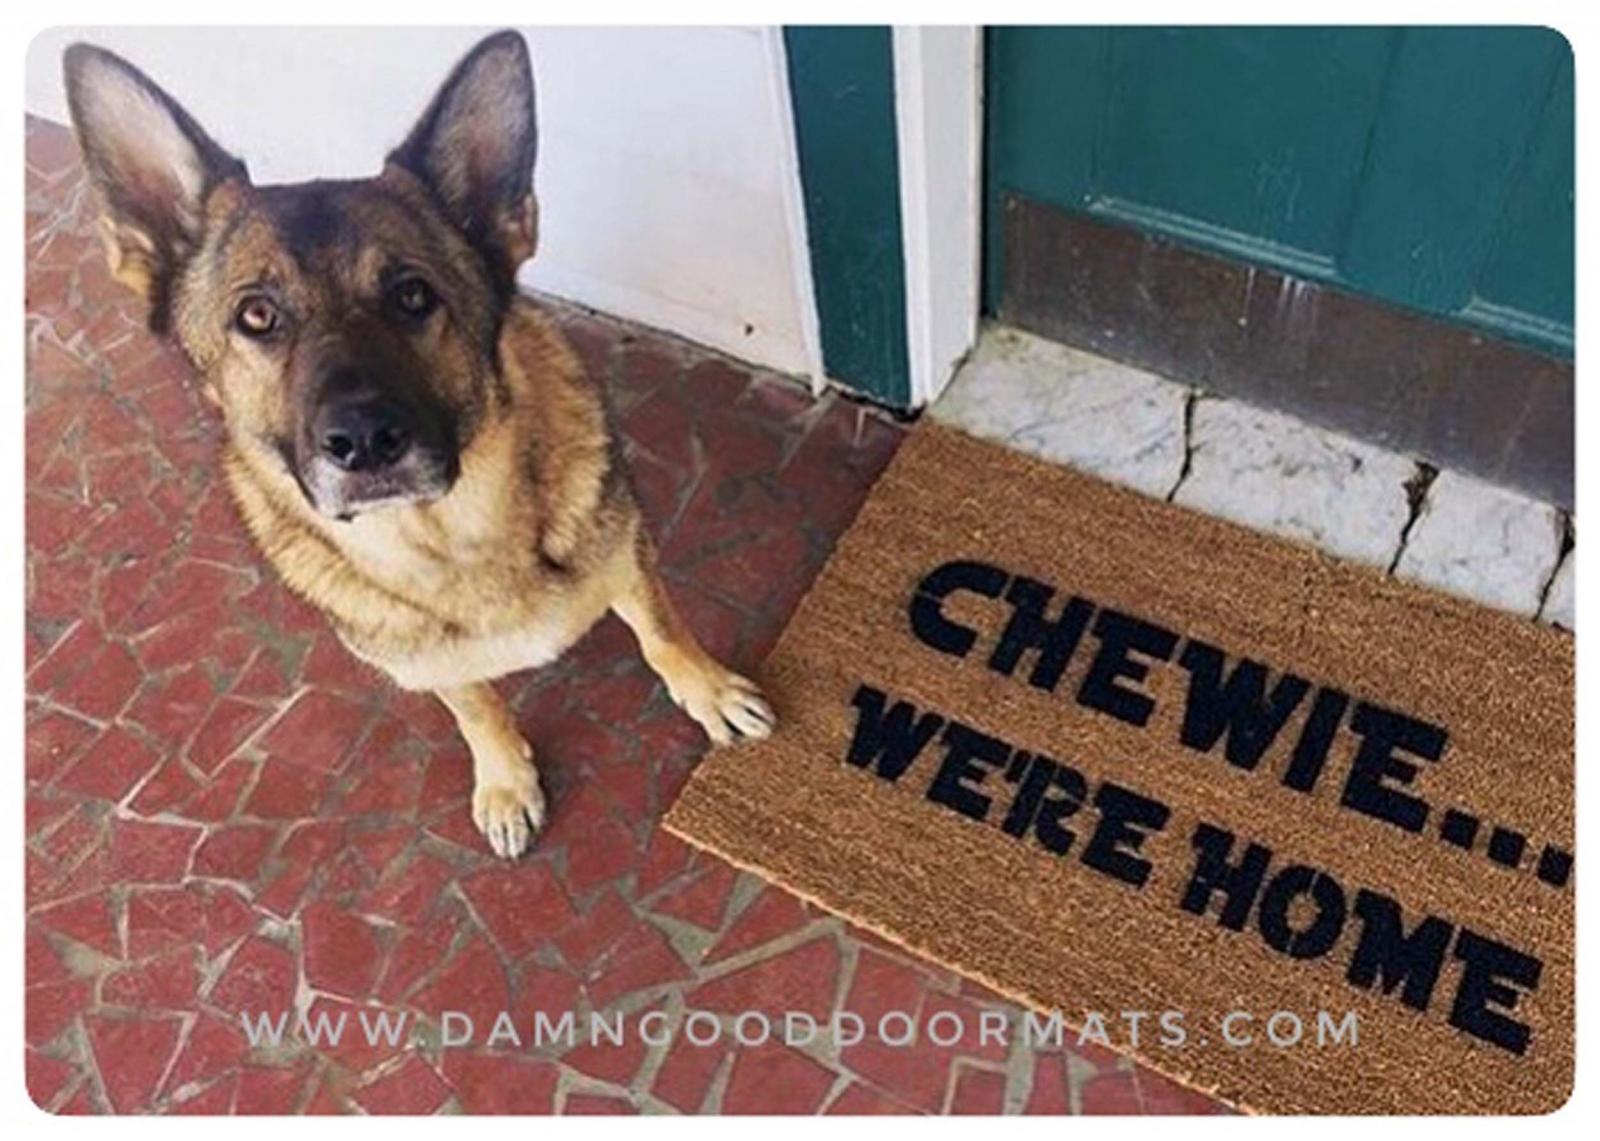 STAR WARS INSPIRED CHEWIE HOME WELCOME COIR DOOR MAT FAN HOUSE WARM GIFT PRESENT